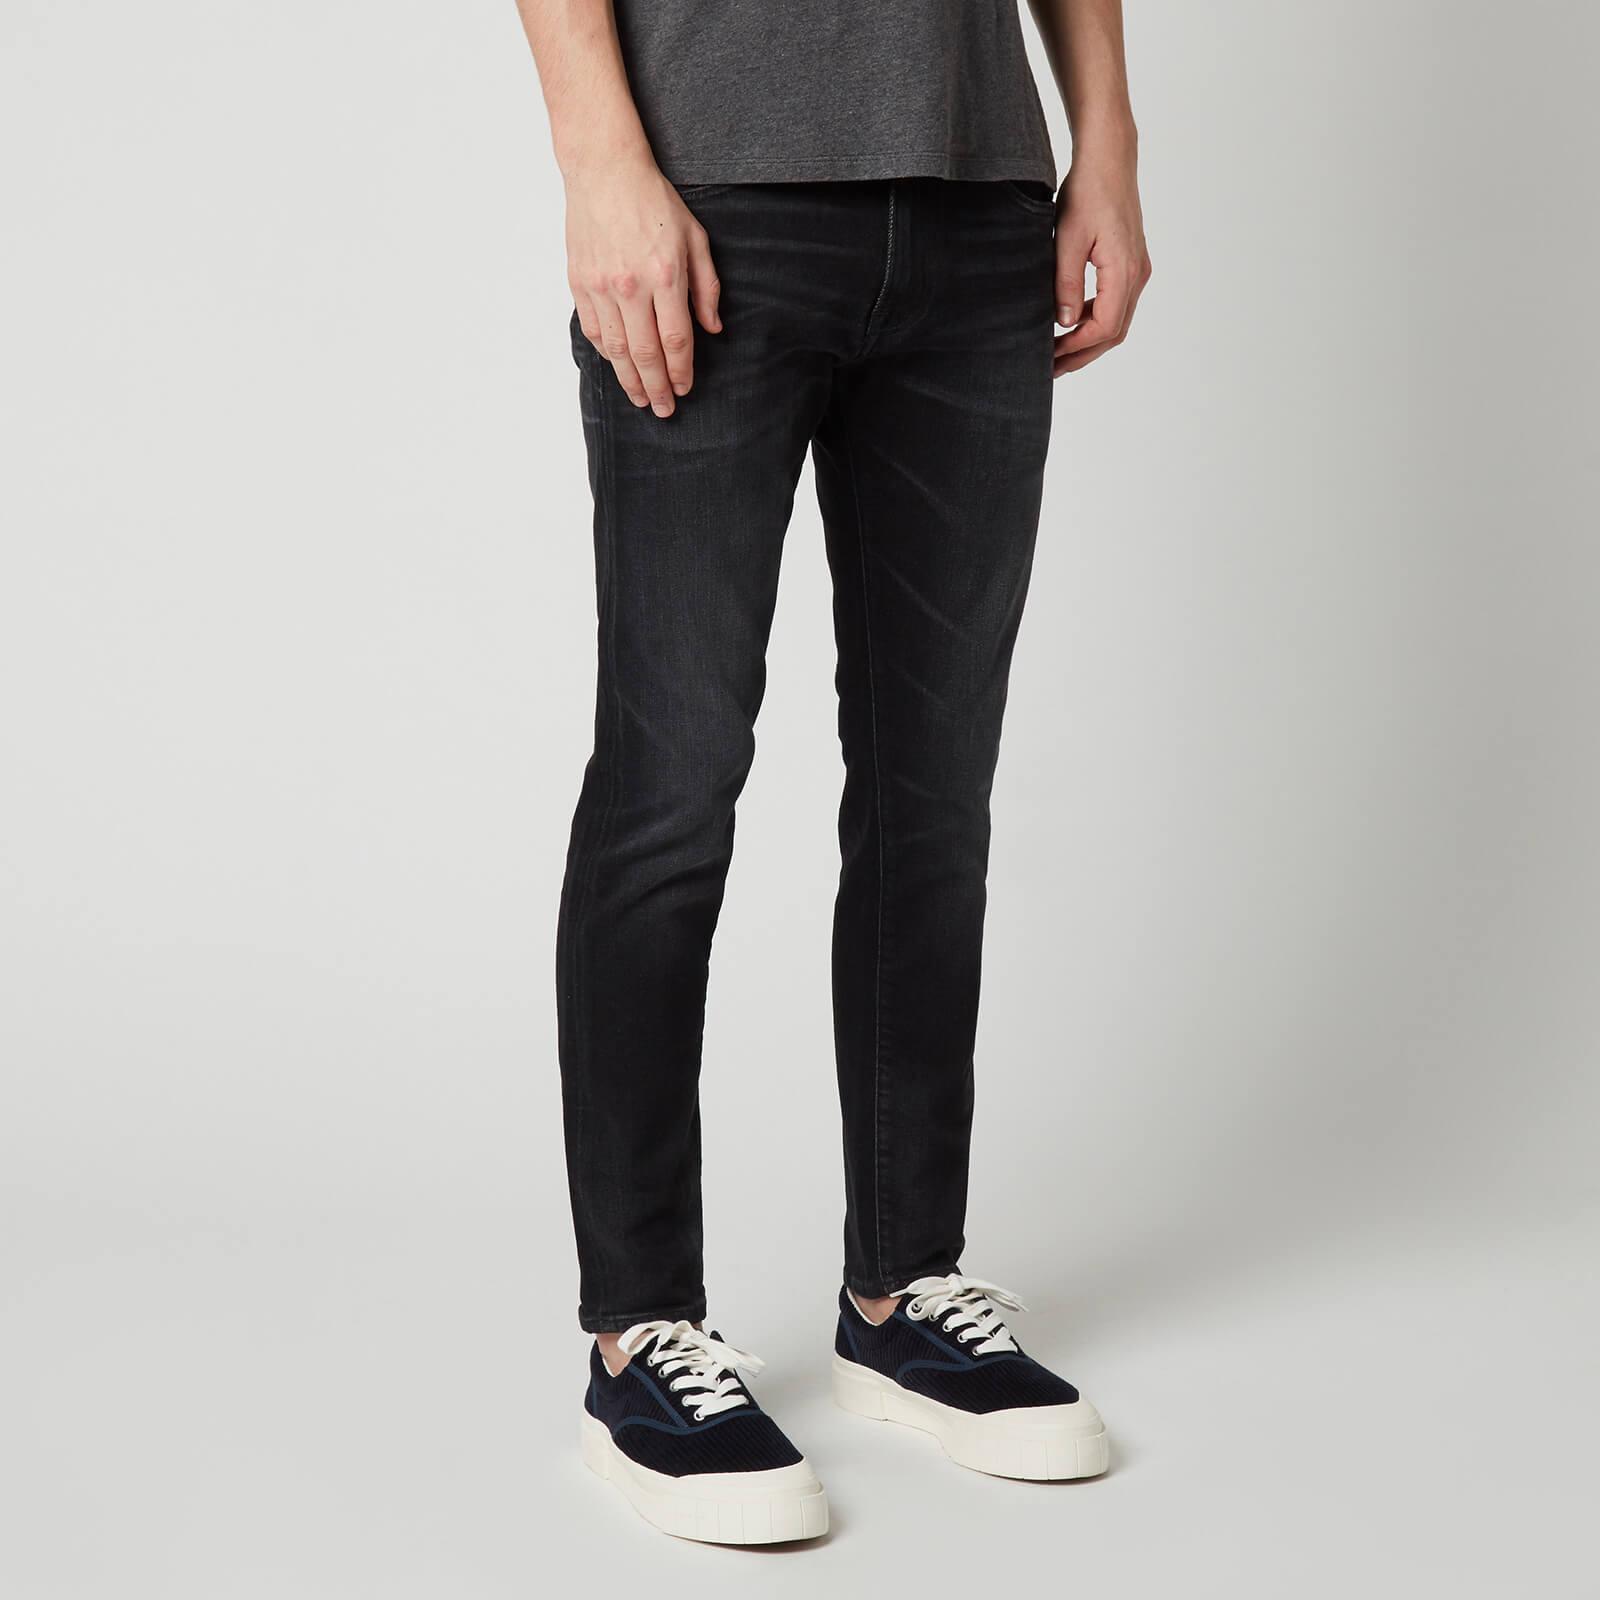 Edwin Ed 85 slim tapered fit mens jeans DROP CROTCH Cs Grey Rinsed stretch